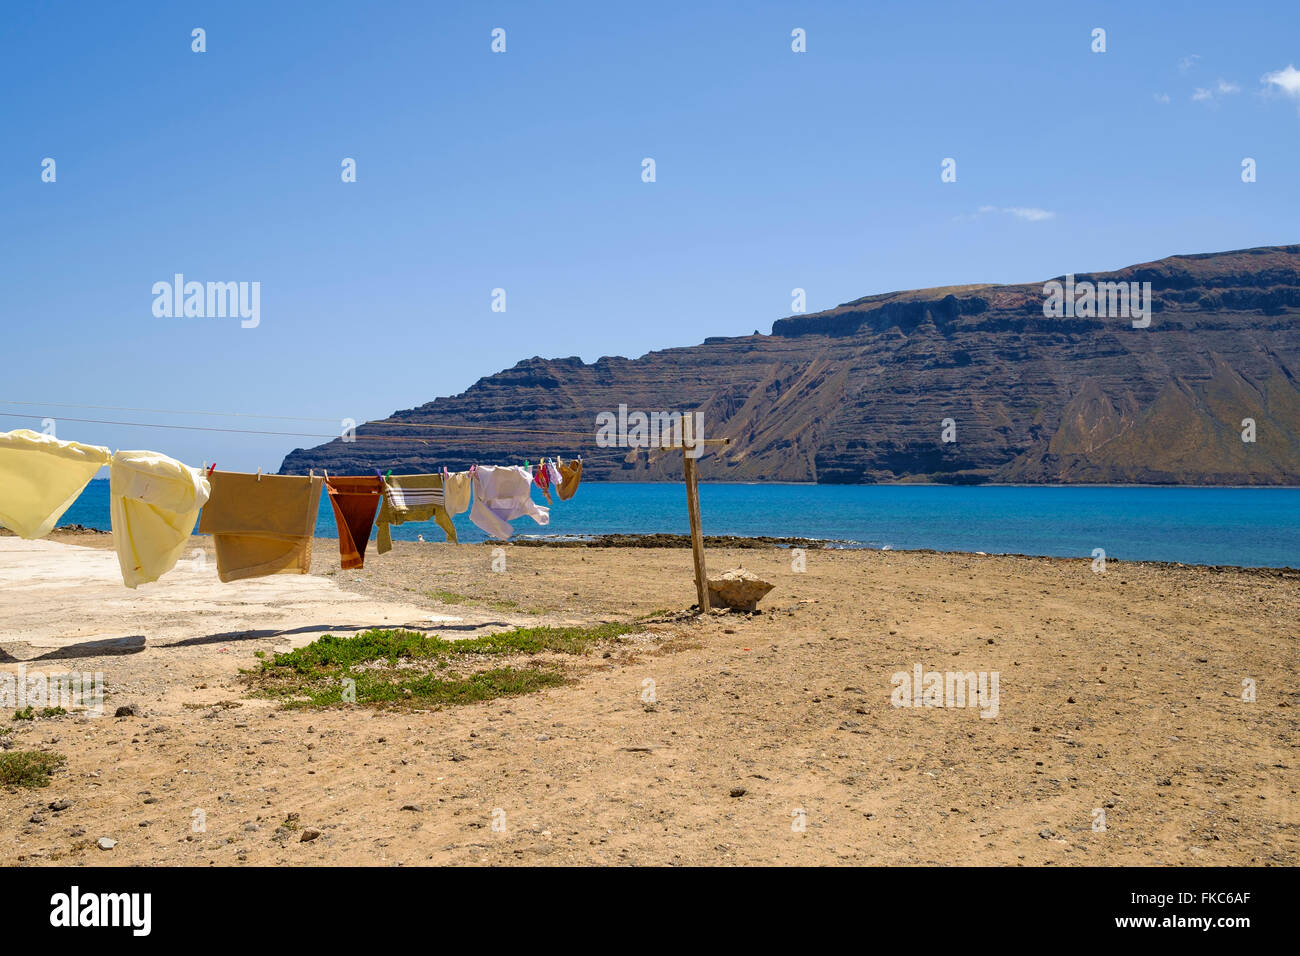 Colourful clothe line in Caleta de Sebo,La Graciosa, Canary islands,Spain,Europe - Stock Image